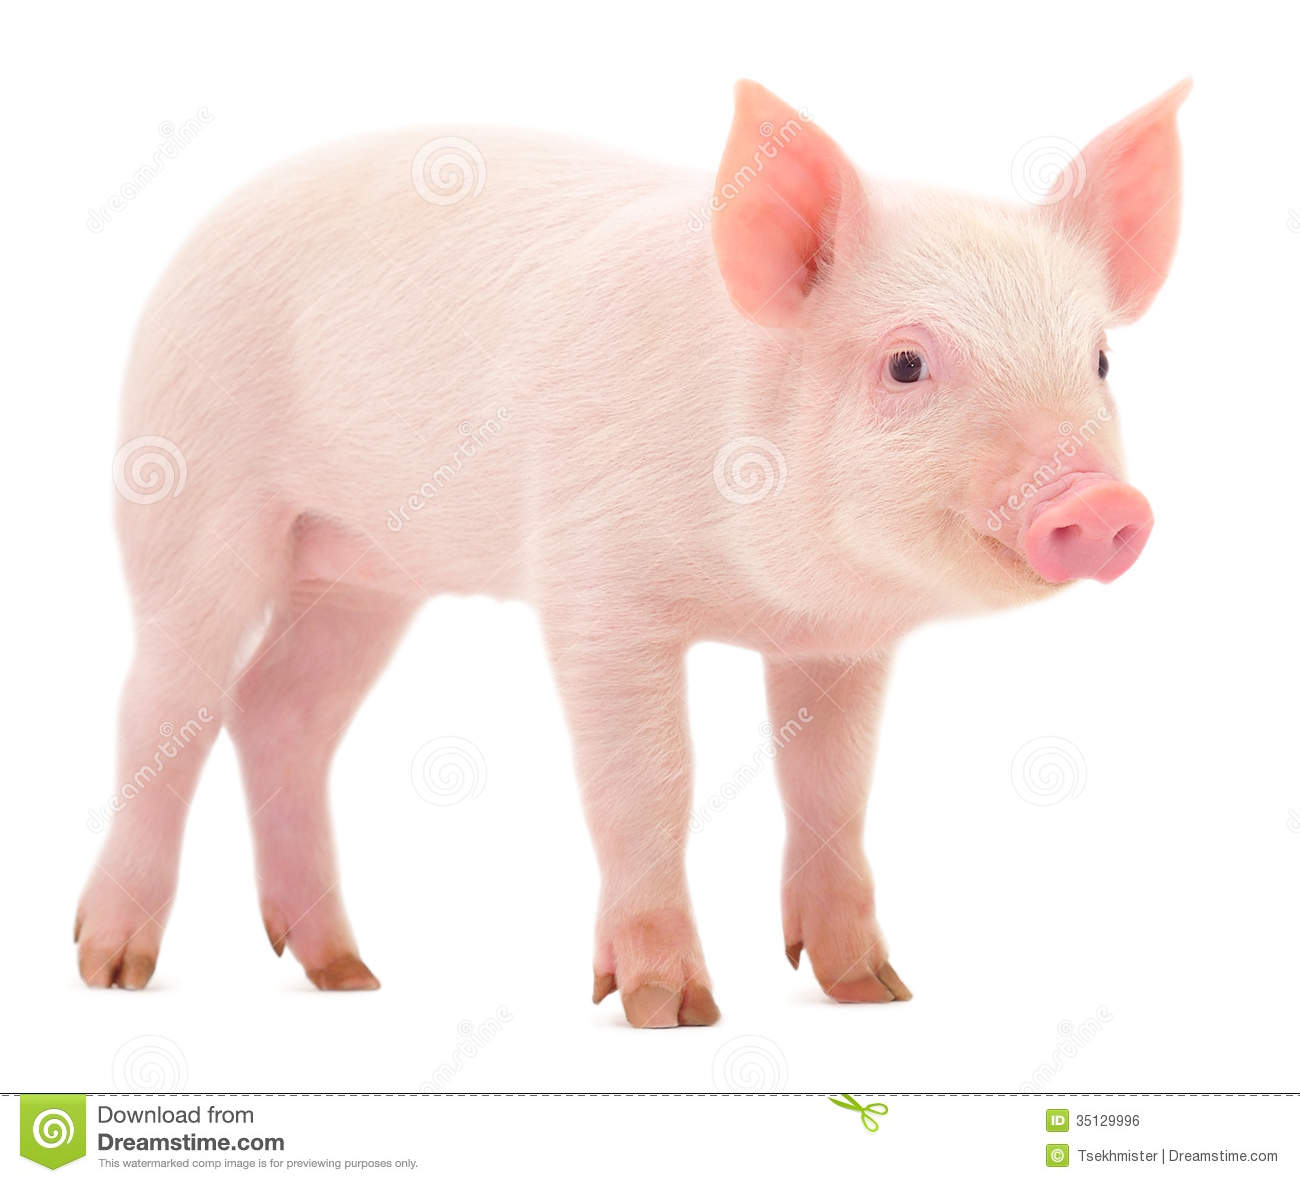 pig pic 1300x1183 d0faed7